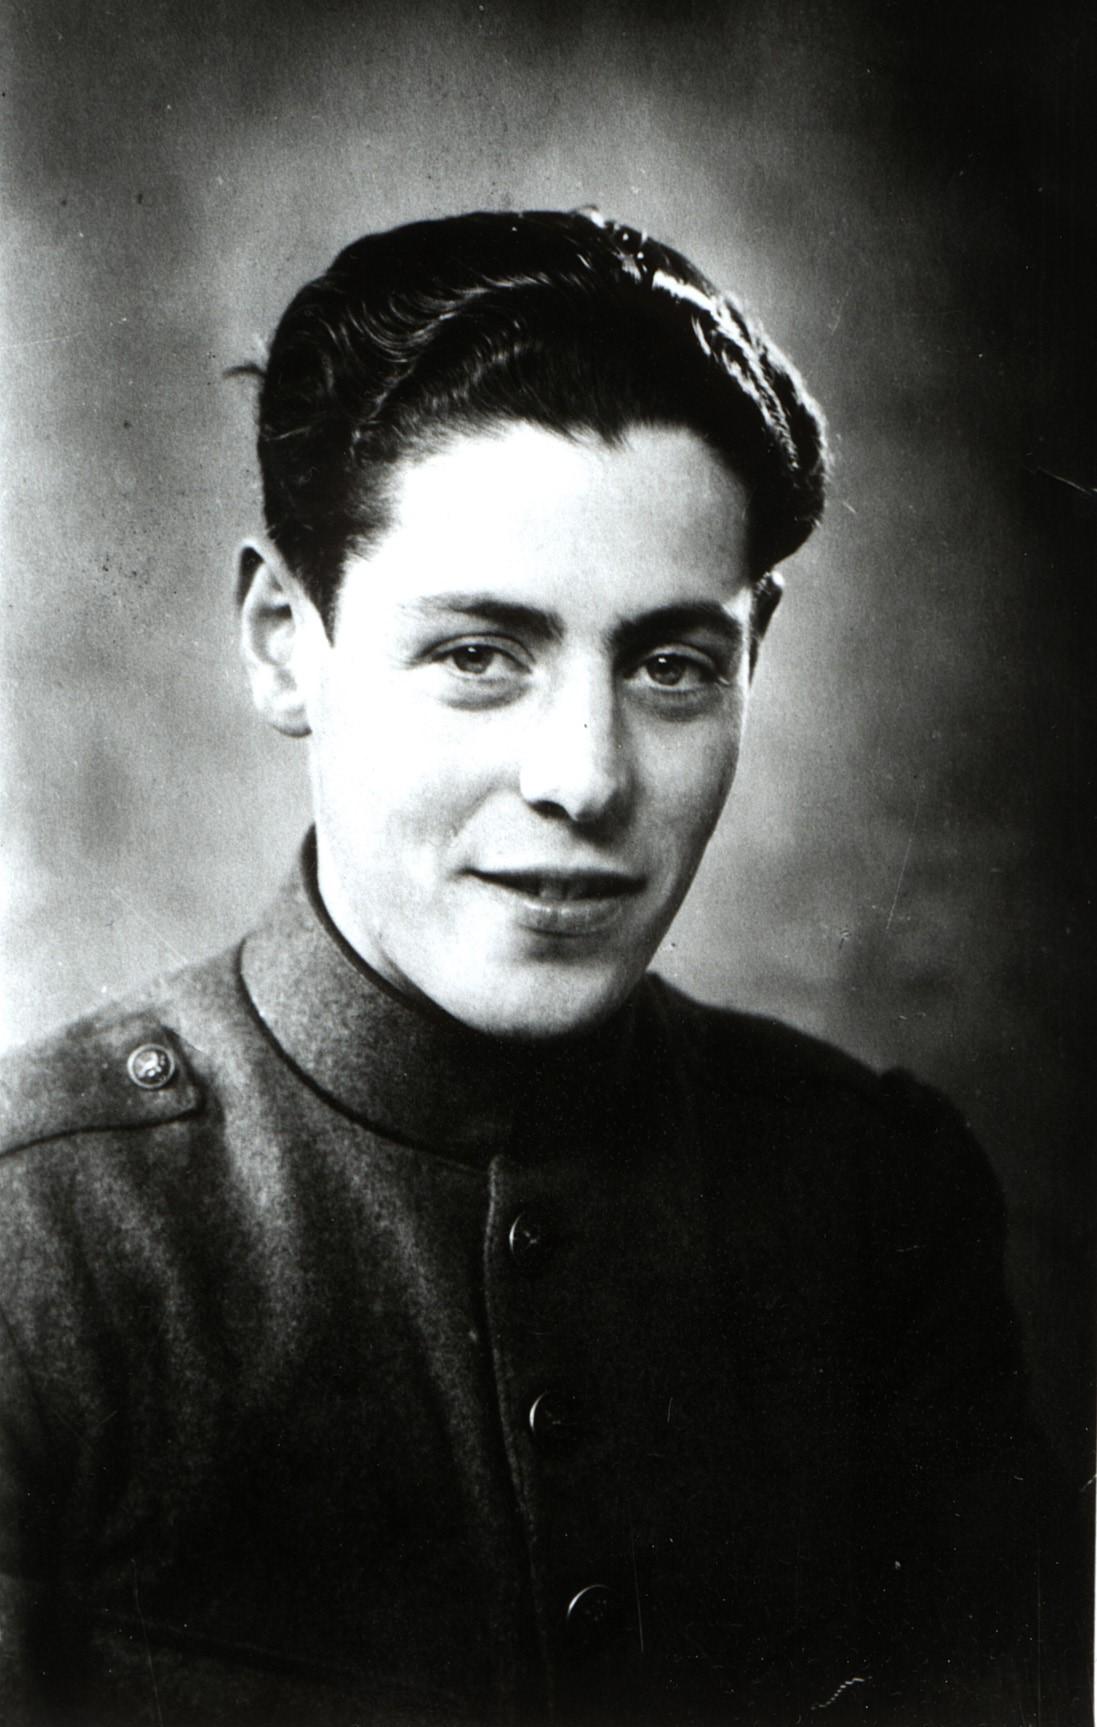 Louis Alfred (Lou) de Jong